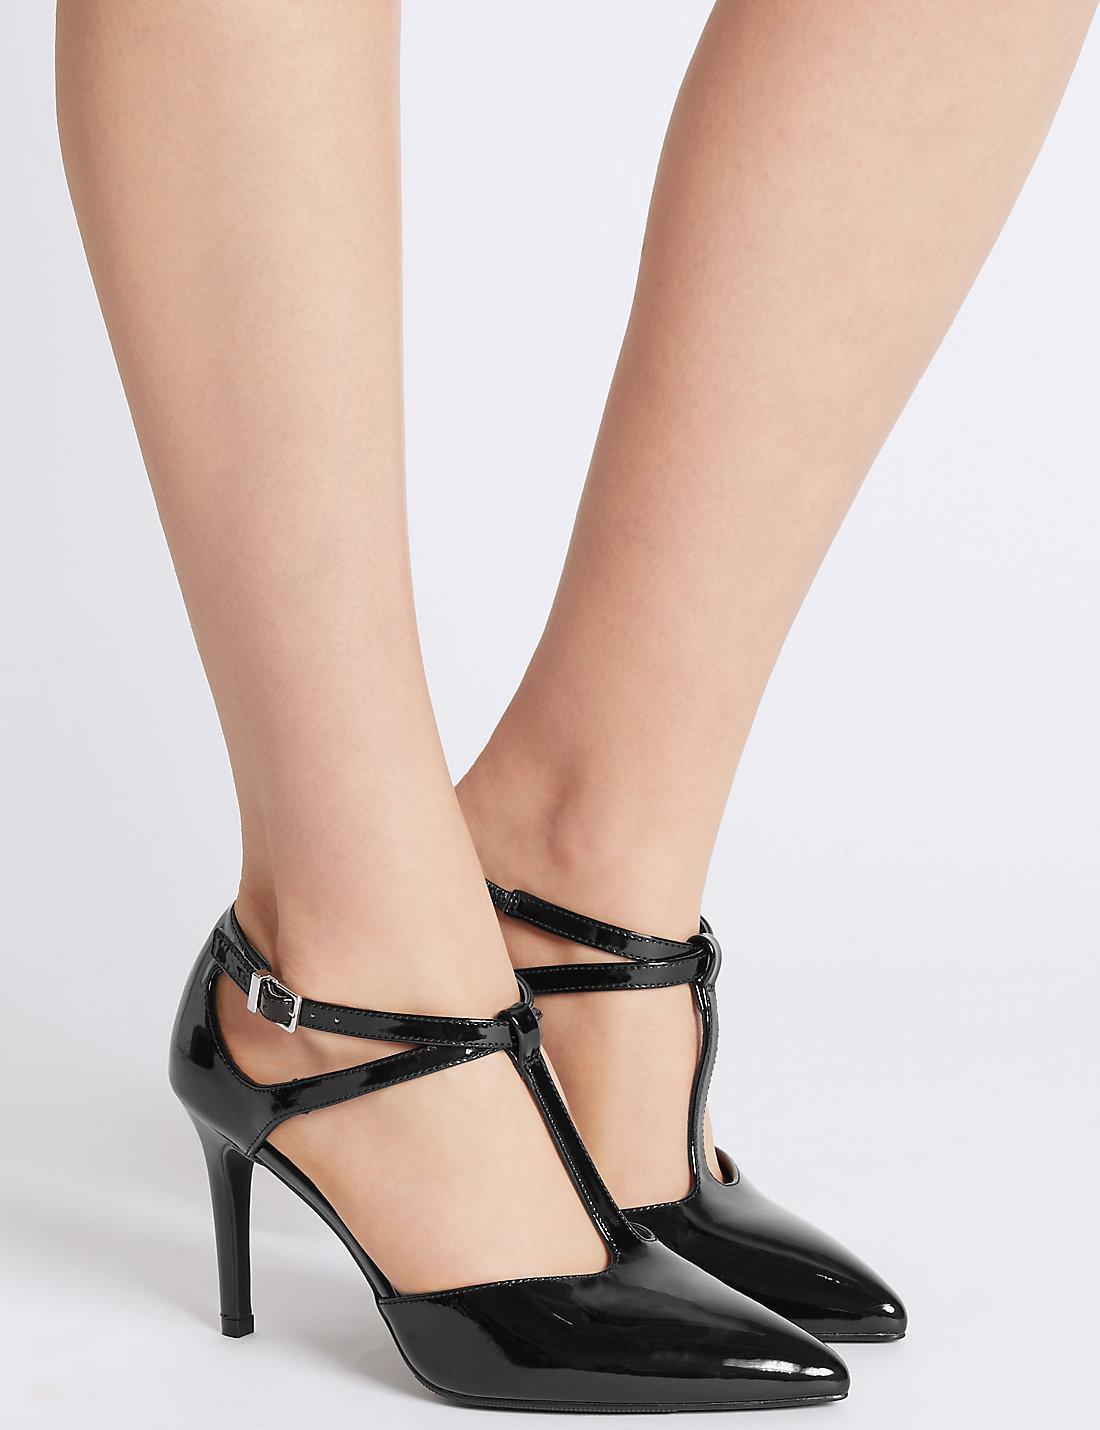 82076490555 Marks & Spencer Black Stiletto Heel T-bar Courts Shoes